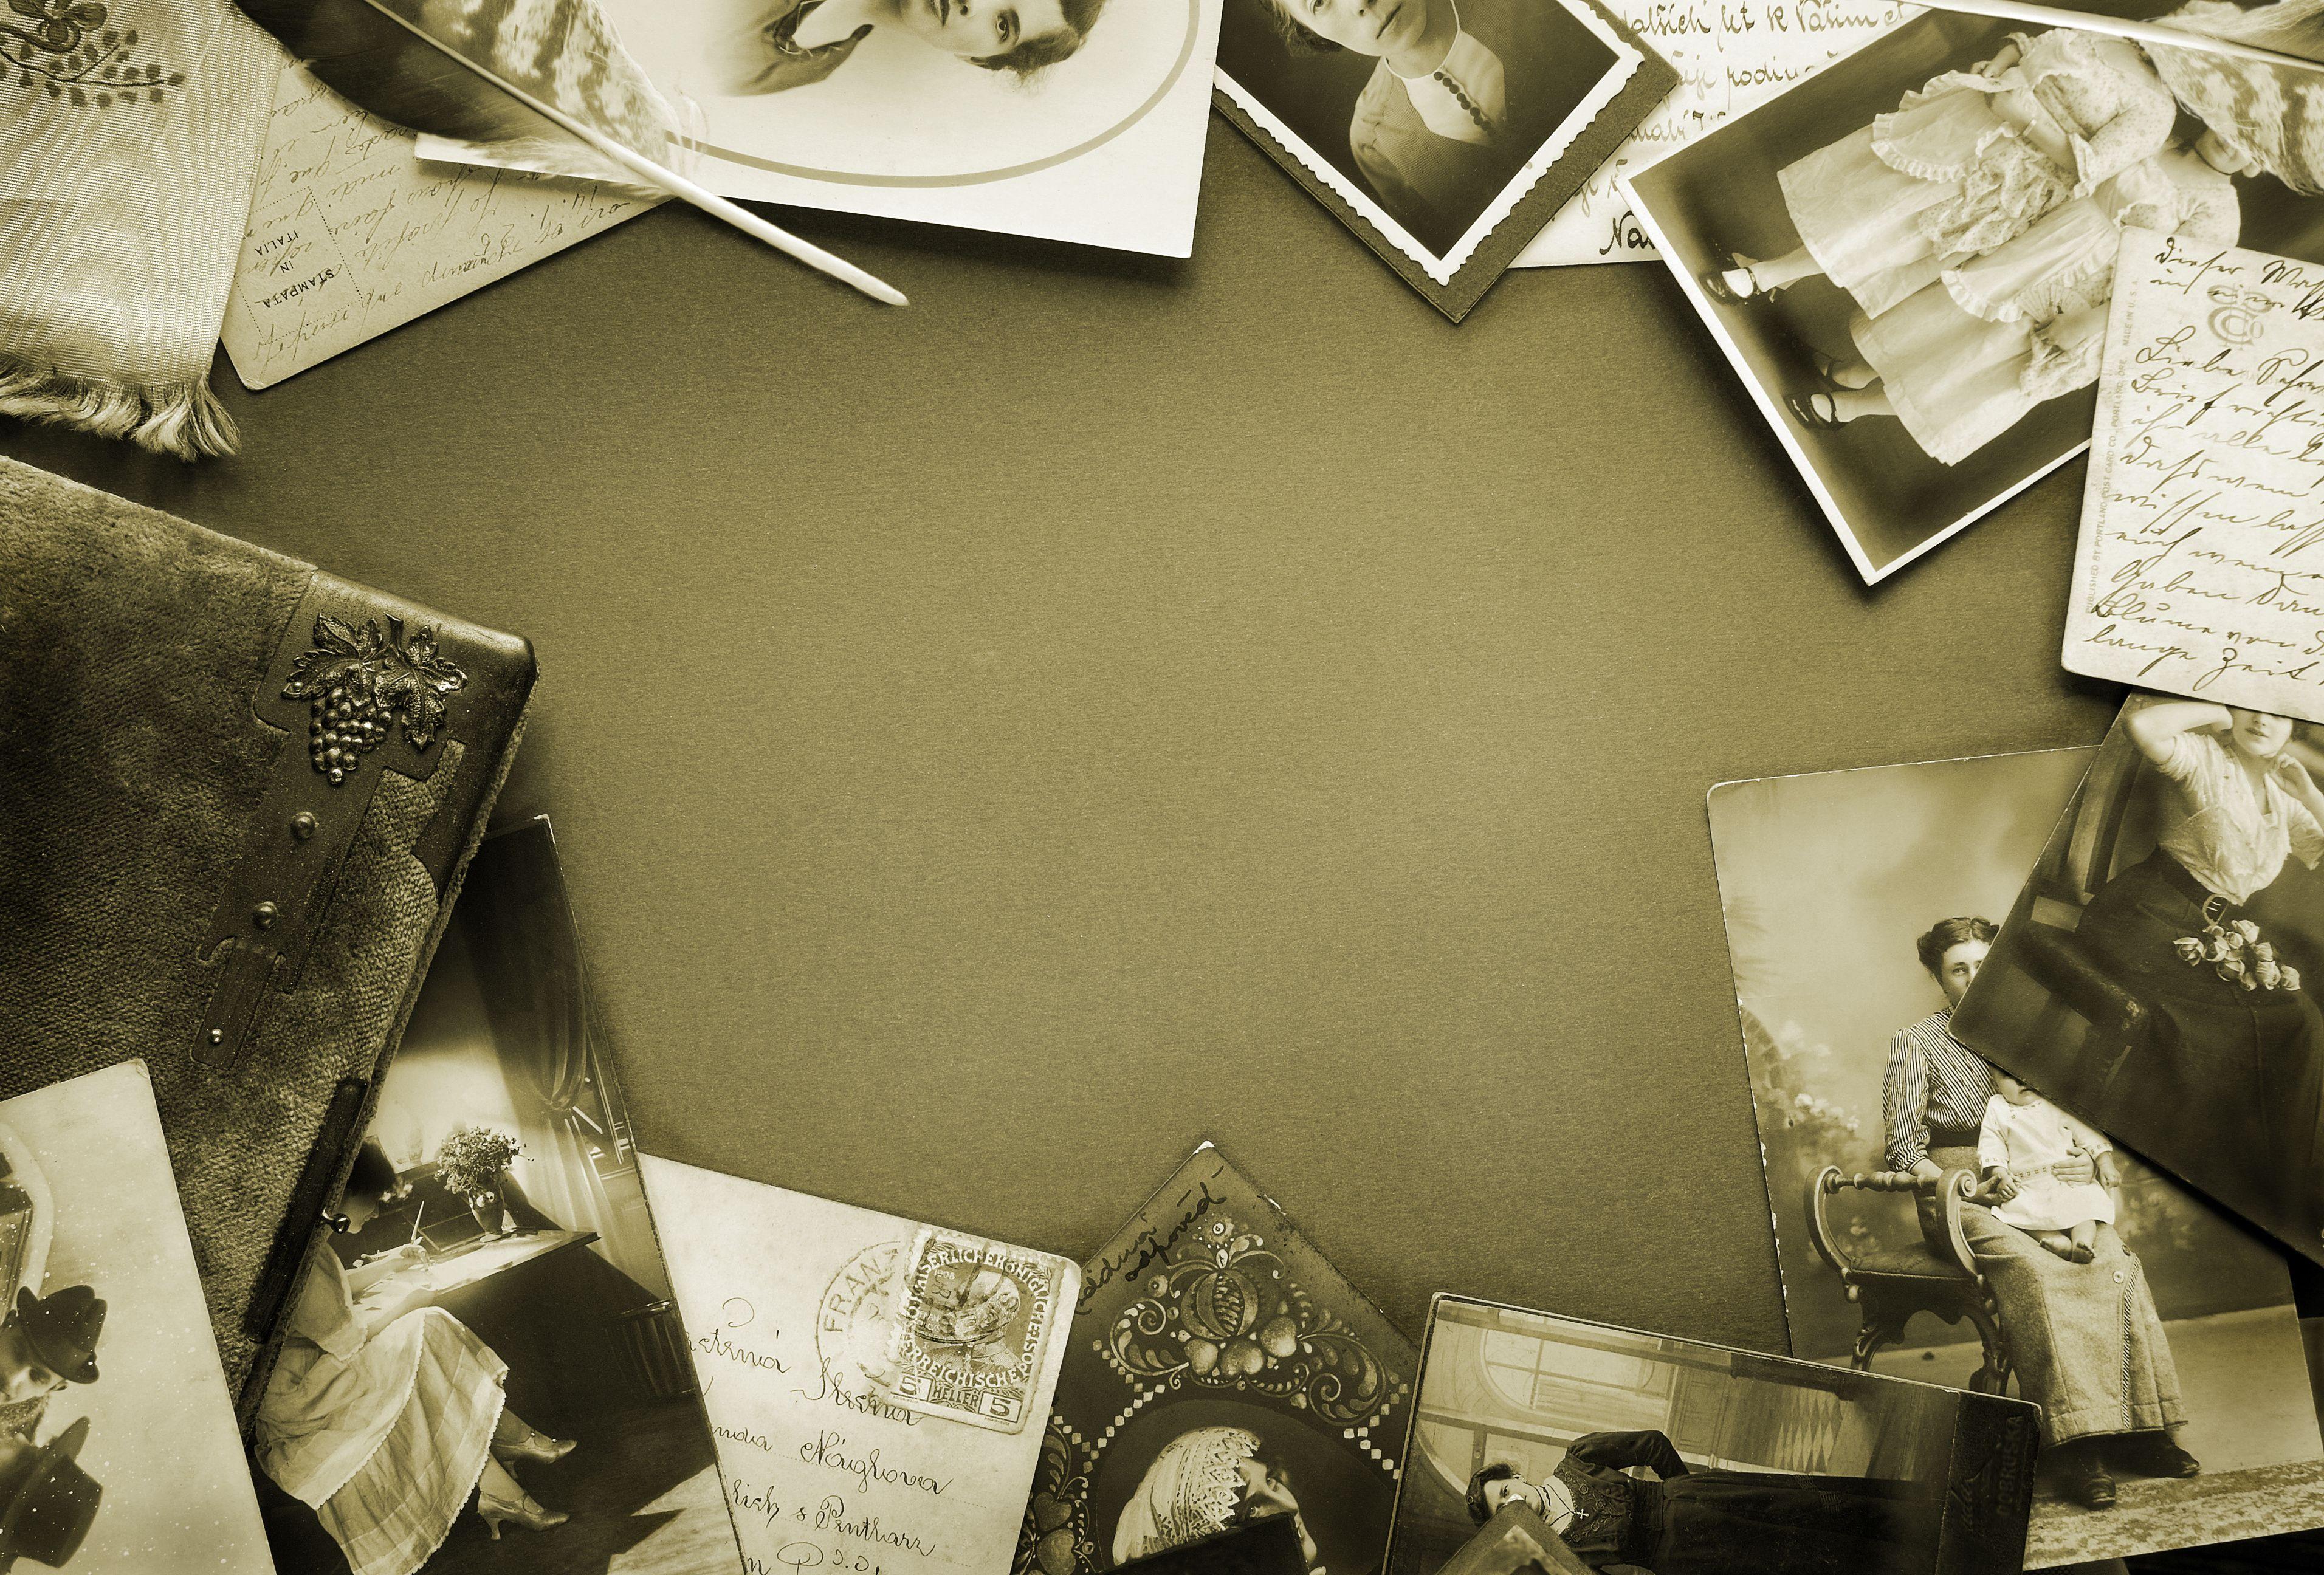 Фон для семейного альбома картинки